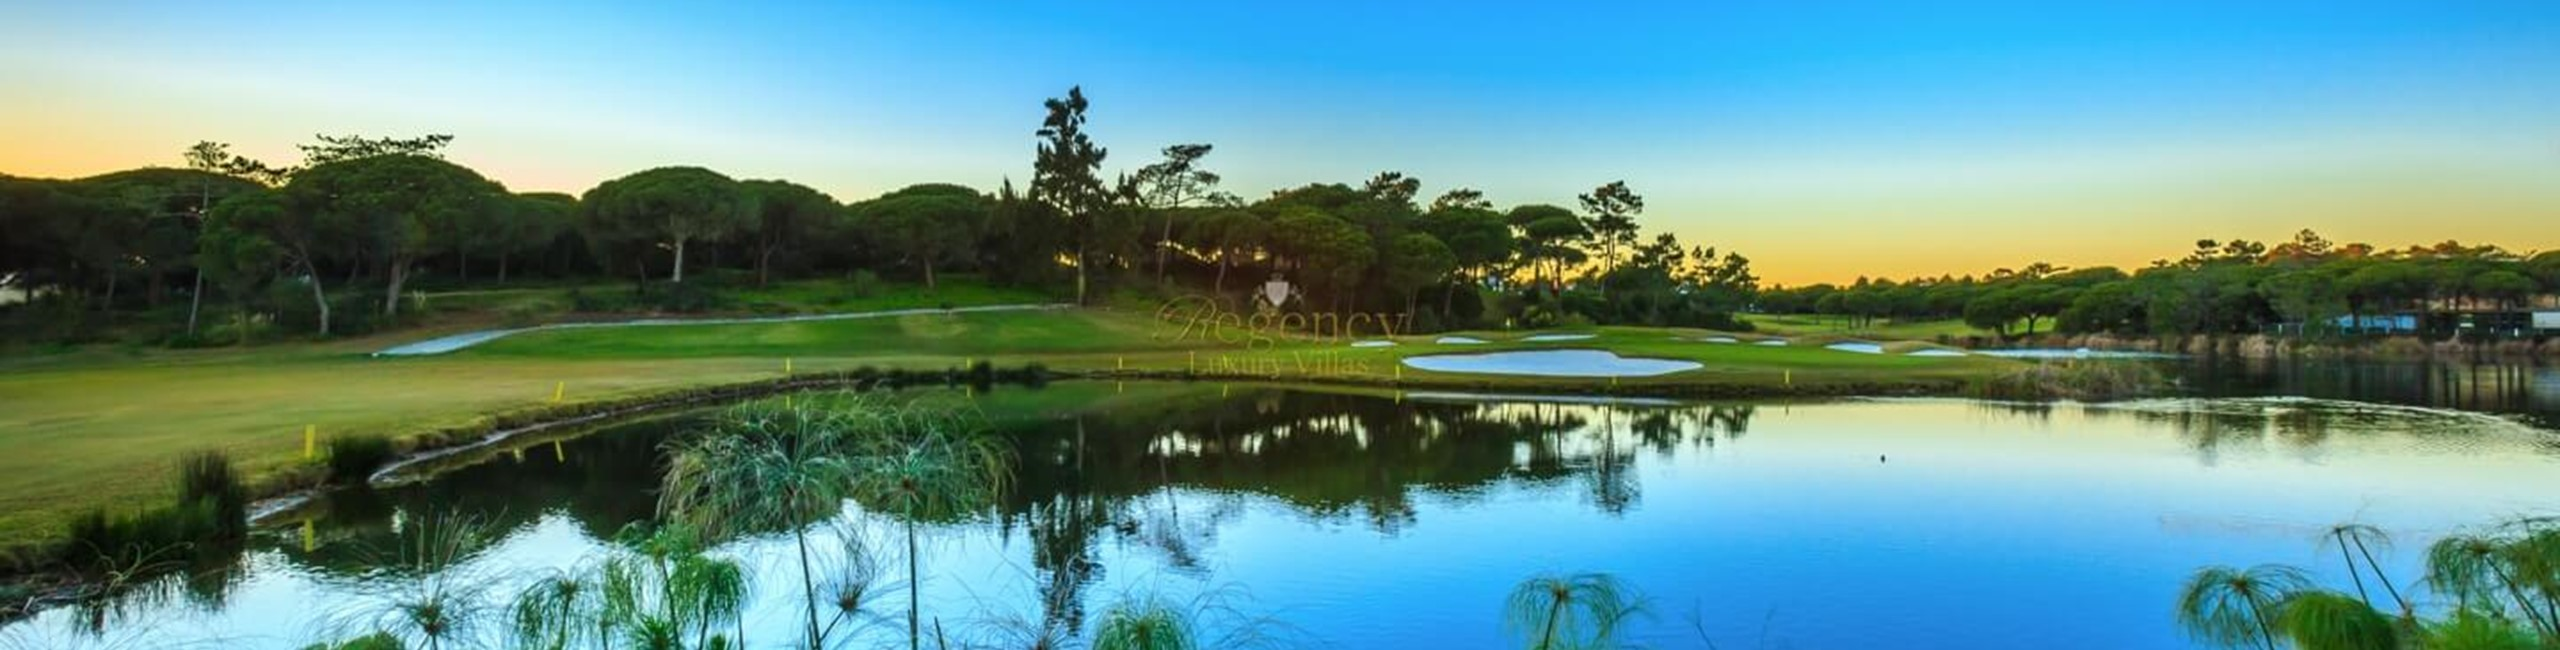 Luxury Villas Holiday Rental In The Quinta Do Lago Resort Regency Luxury Villas